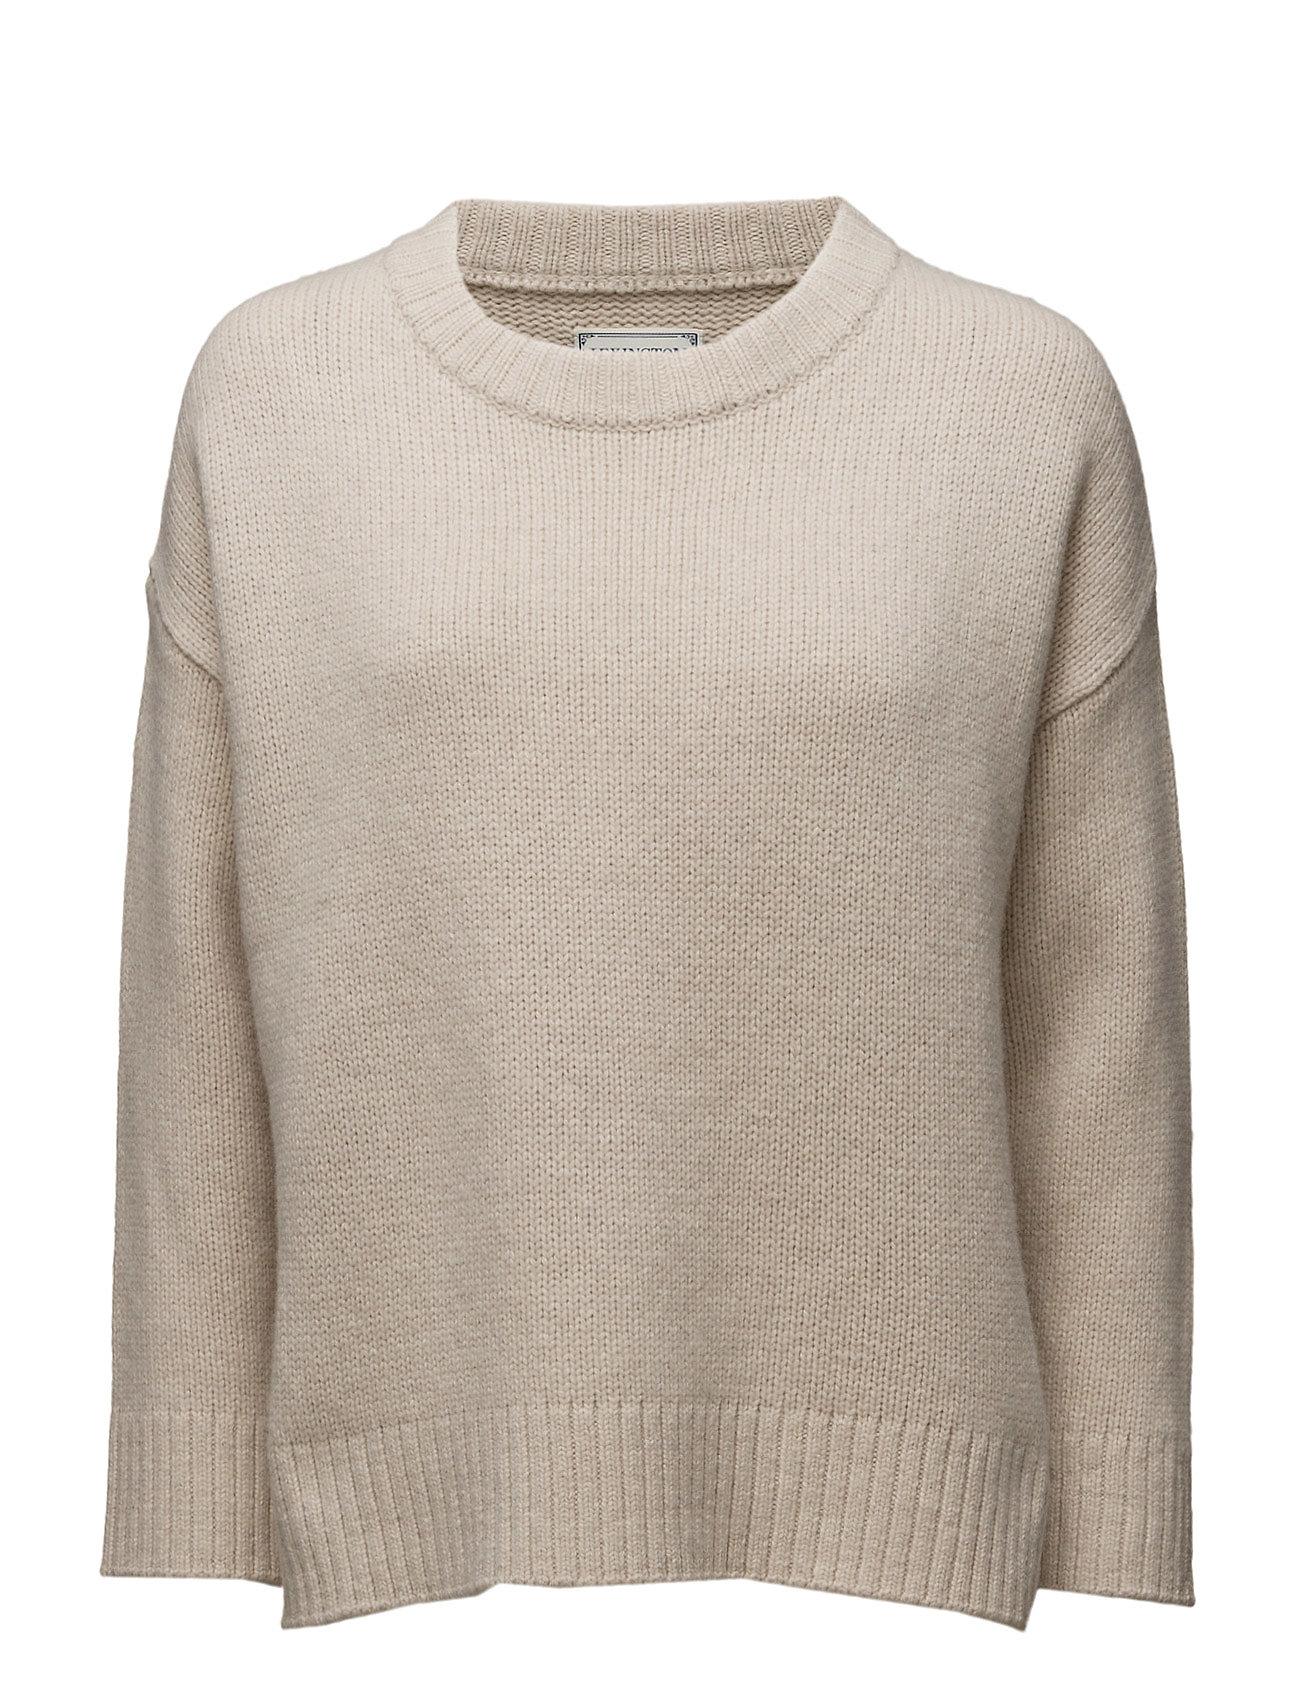 Amber Lee Sweater Lexington Company Sweatshirts til Kvinder i